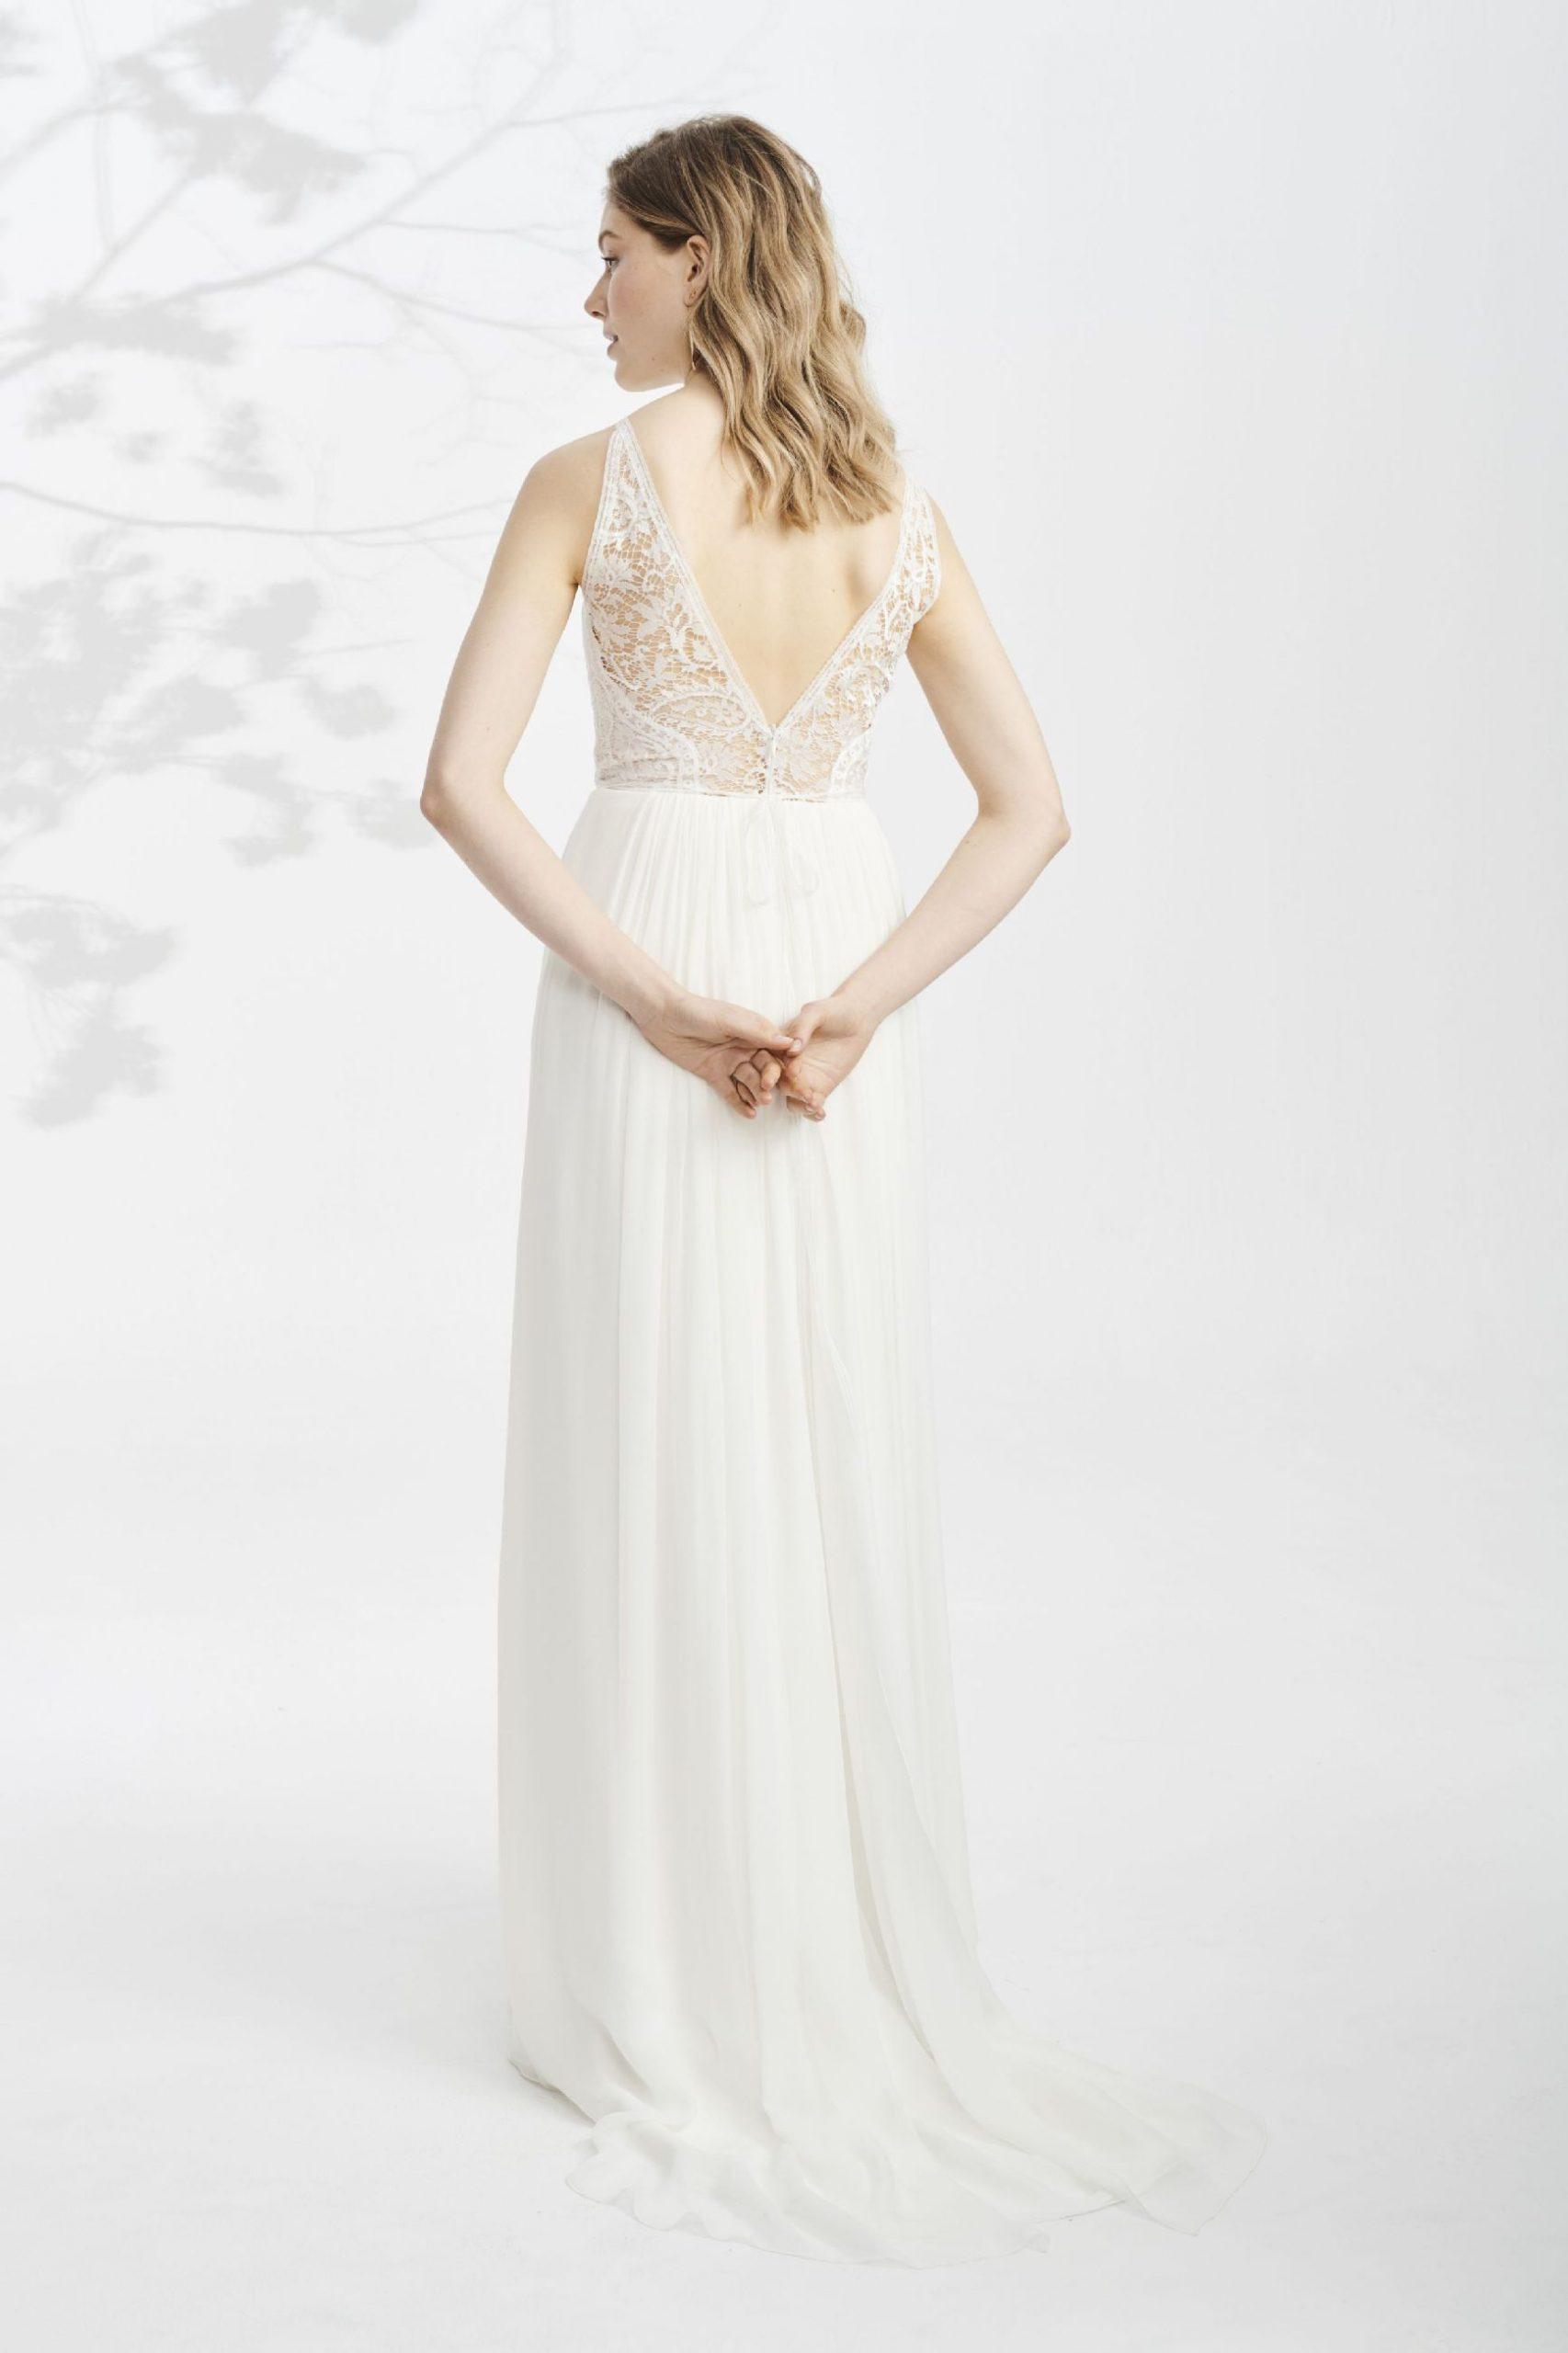 Weddingdress Maiga ♥ Fluent Weddinggown In With A Beautiful